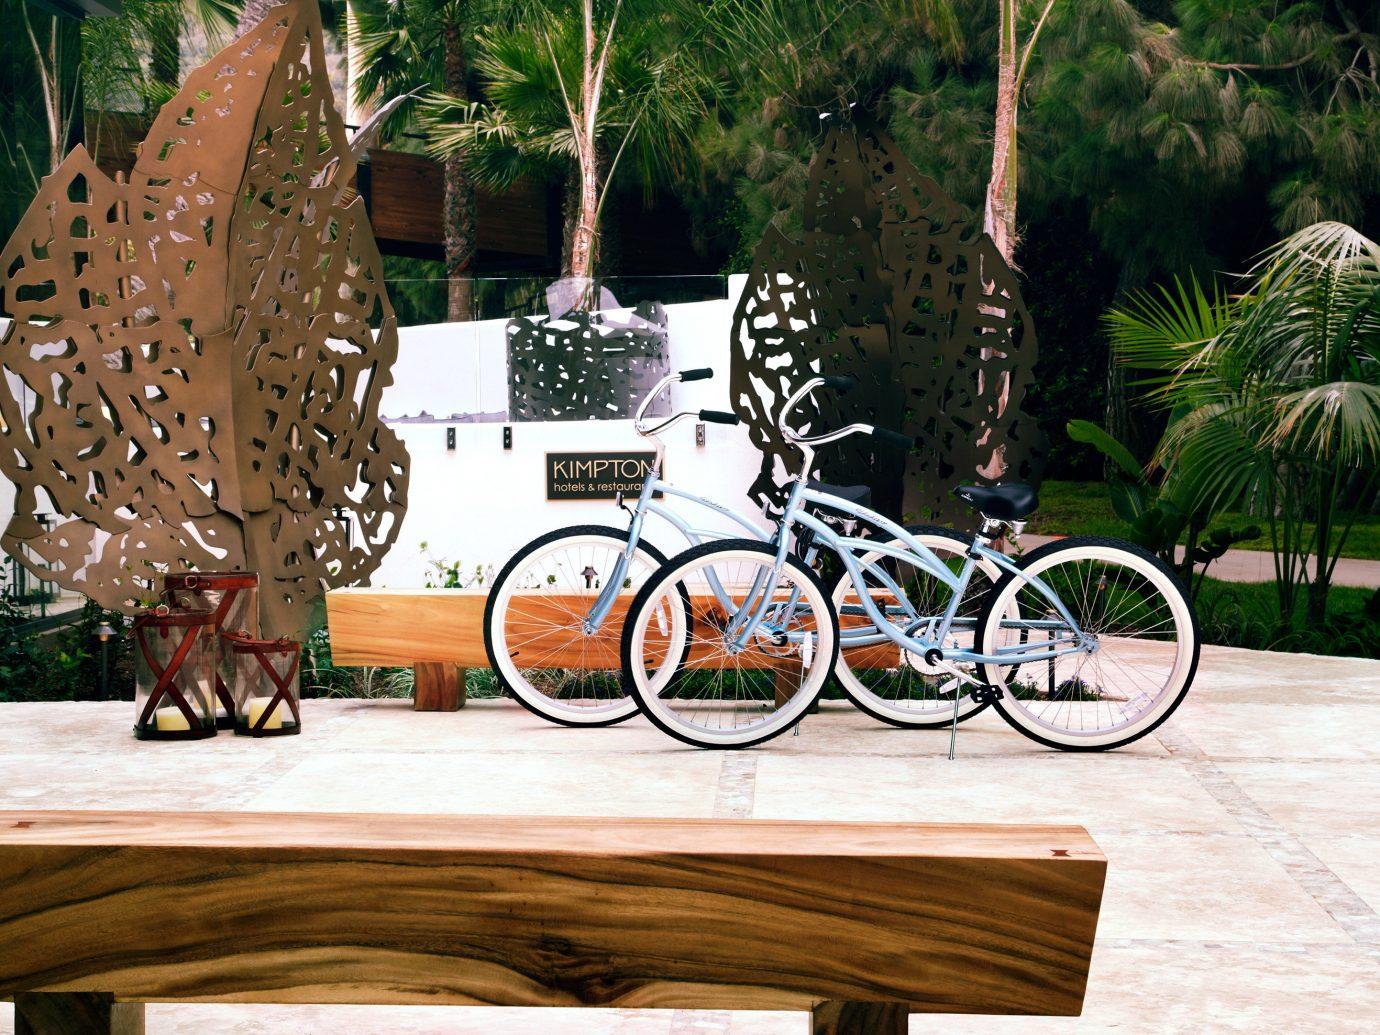 Bicylces Outside Hotel La Jolla In San Diego, Ca